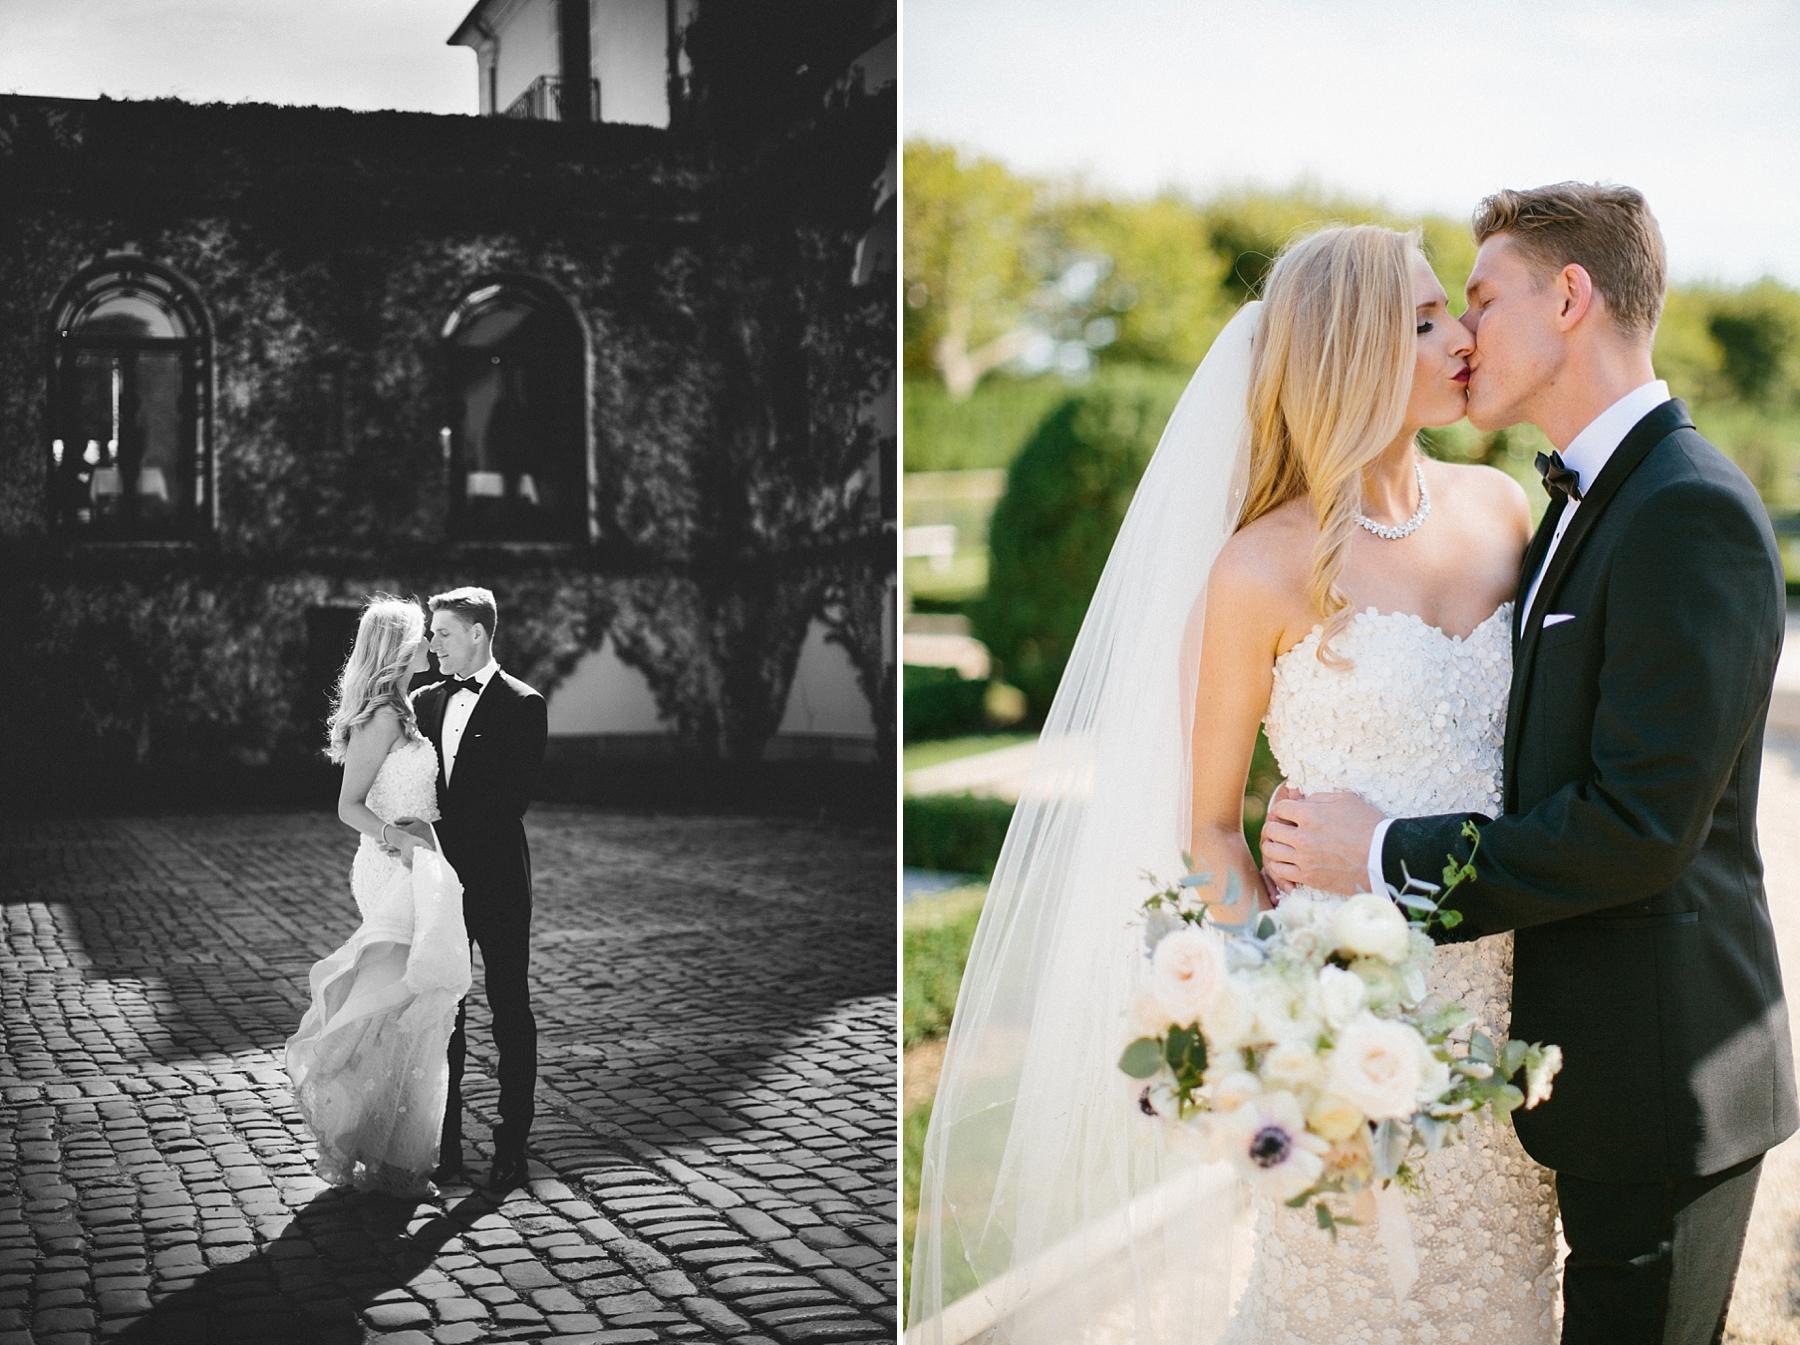 oheka-castle-wedding-nyc-photographer-long-island_0018.jpg